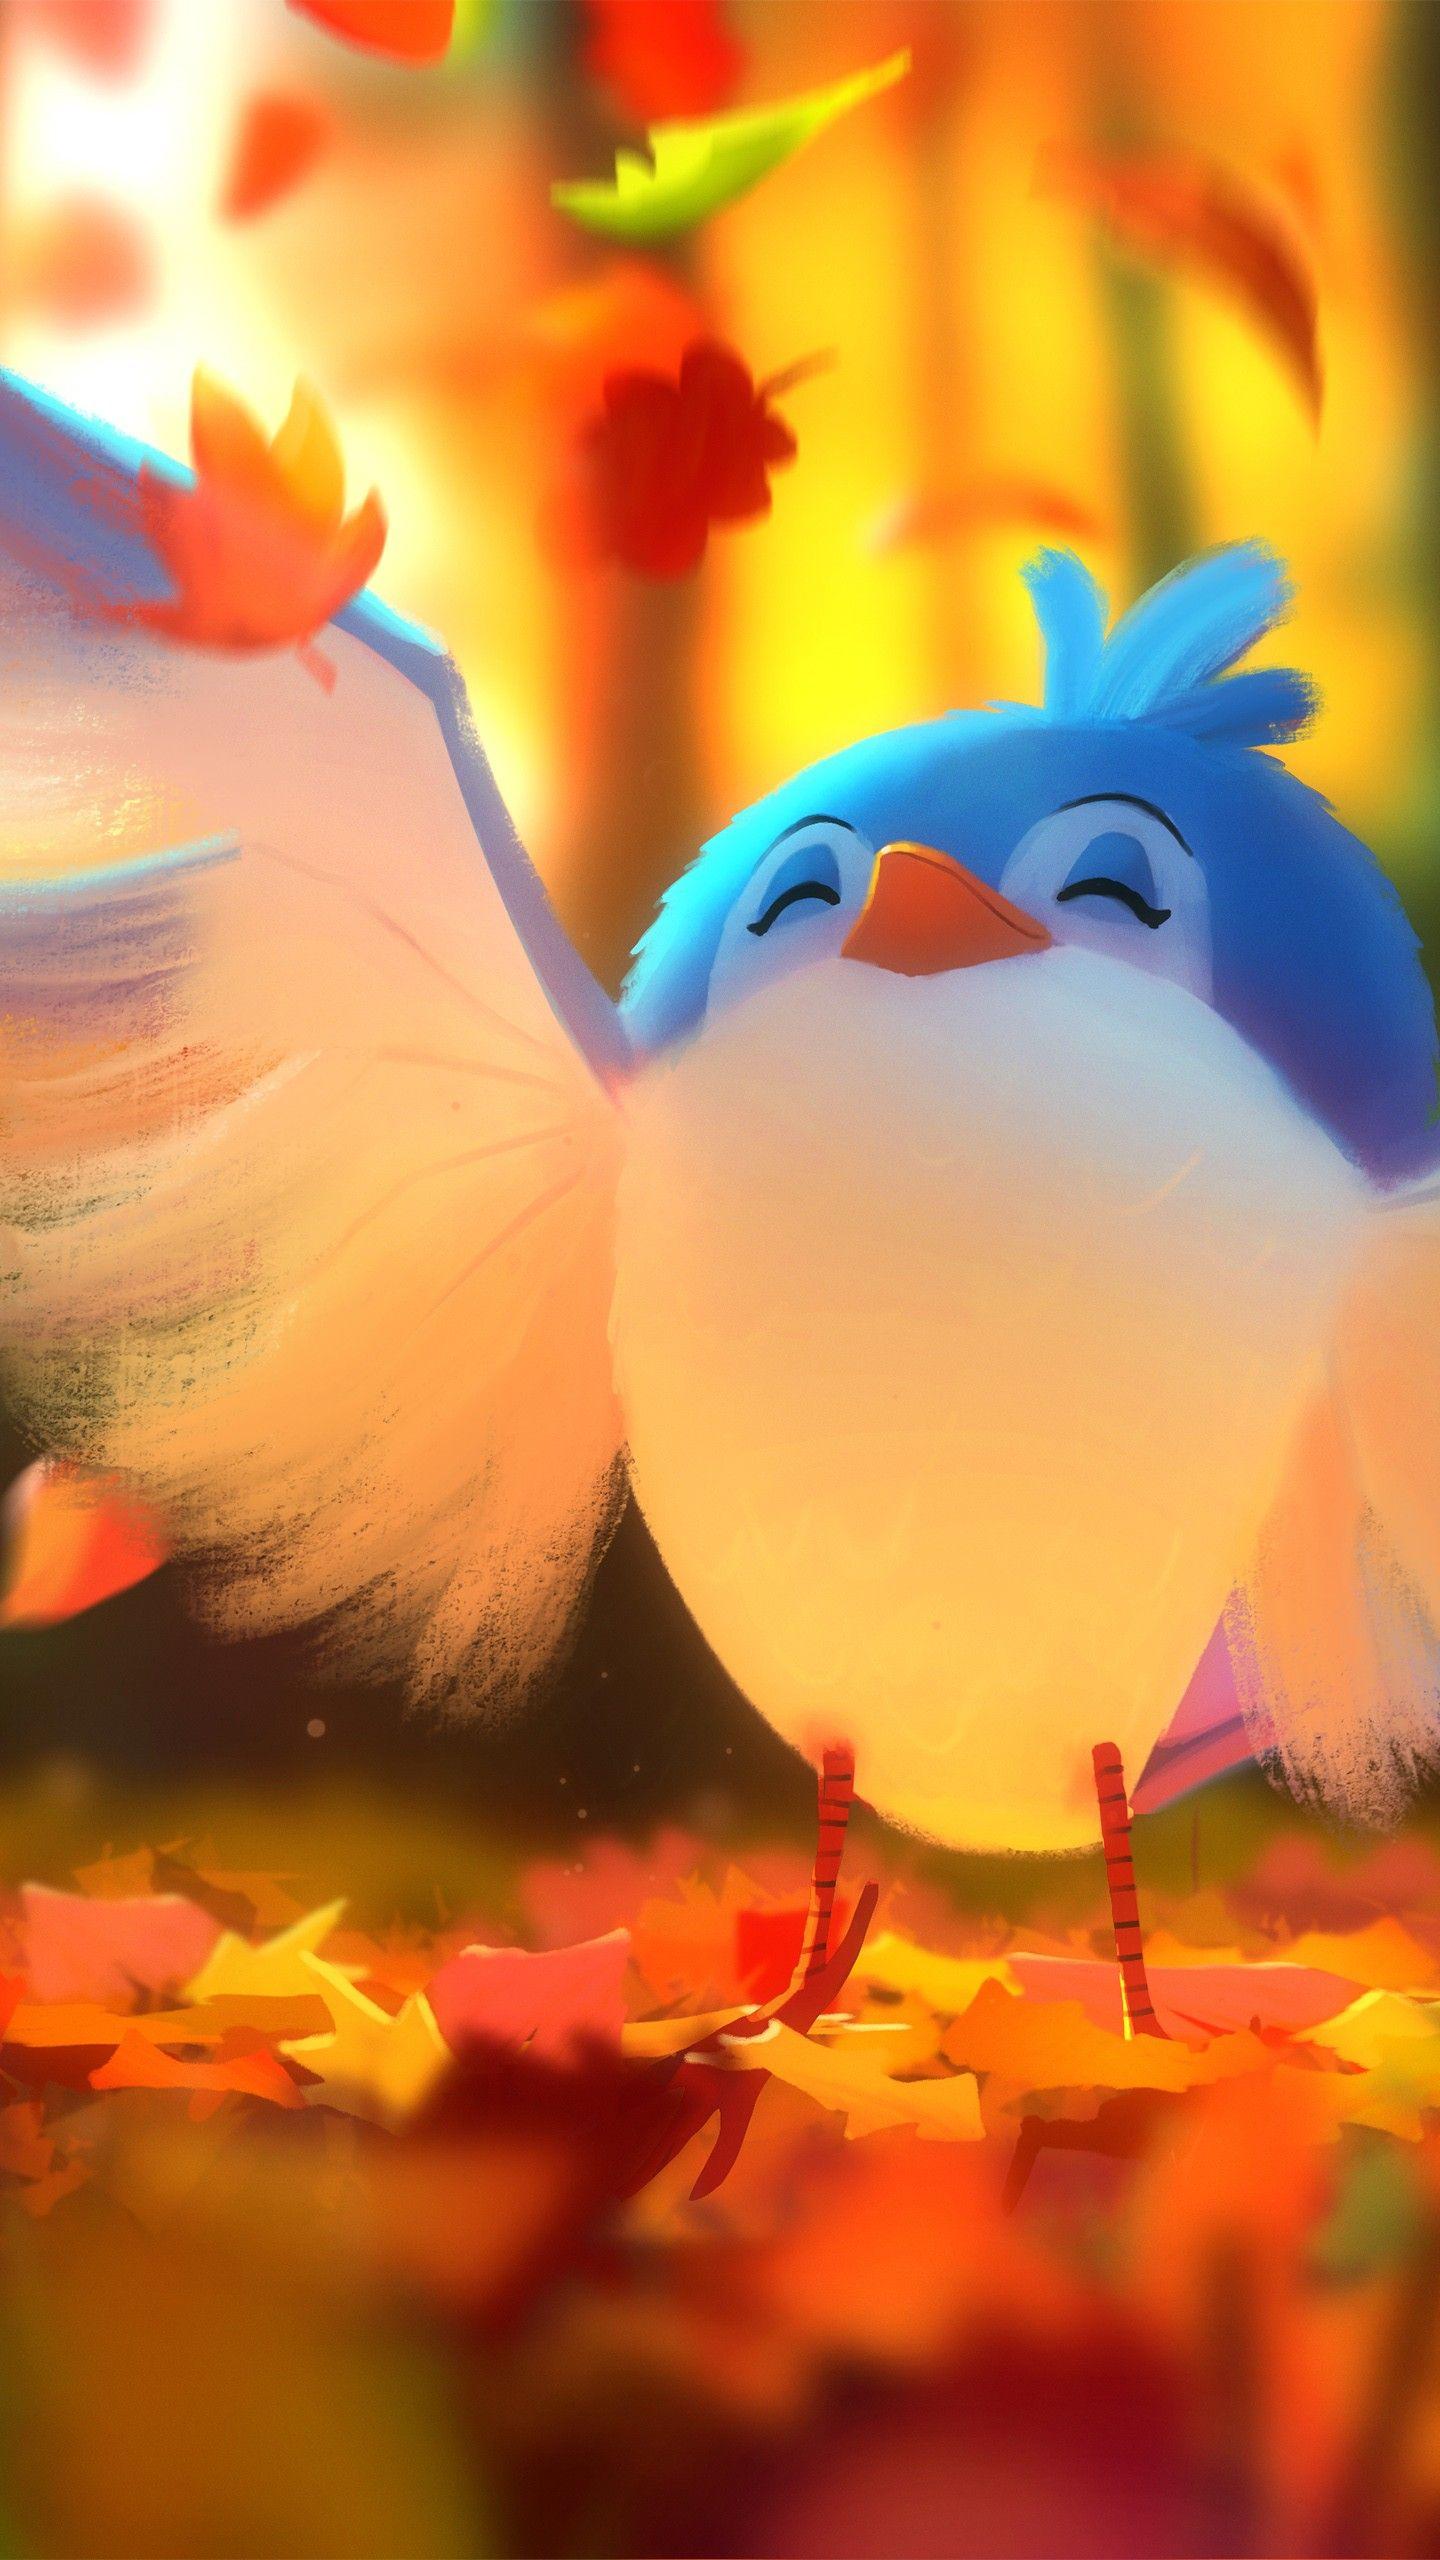 Misc Cute bird Digital art 4K wallpapers hd 4k background for 1440x2560